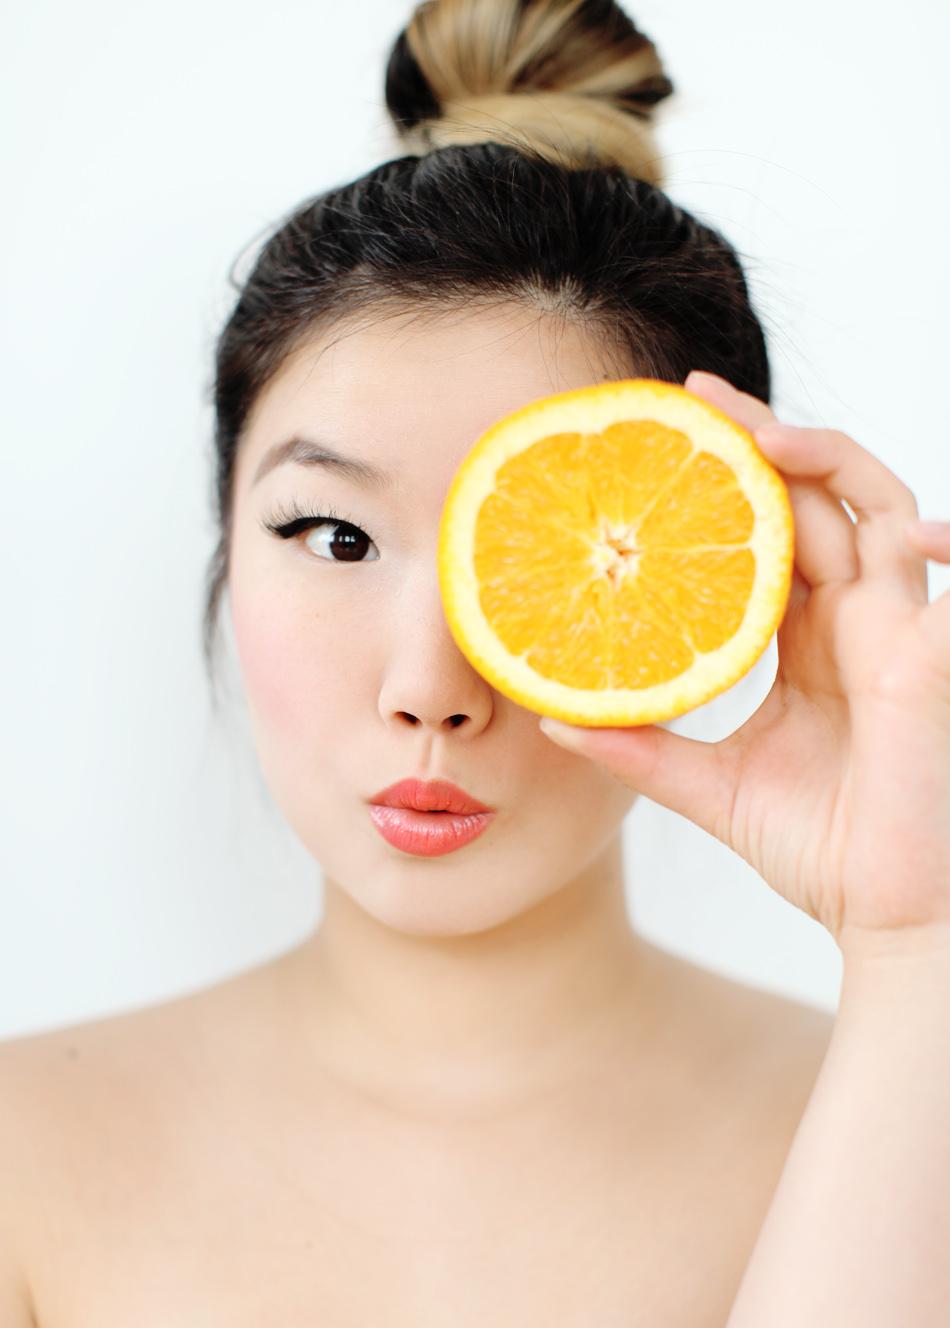 jinna_yang_orange_fruit_makeup_beauty_hair_bun